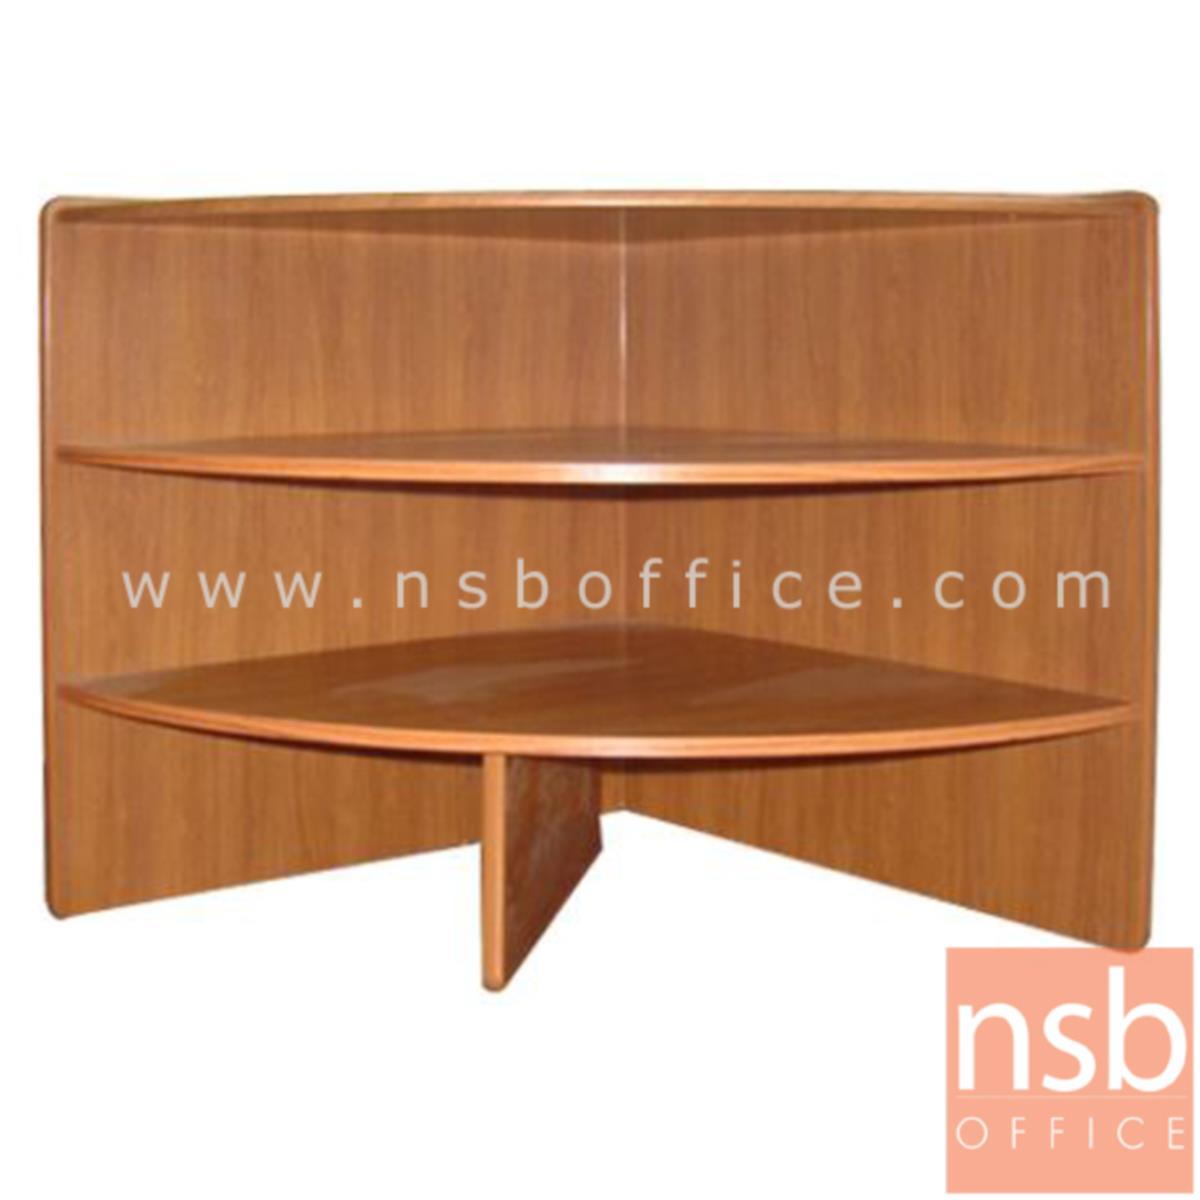 A01A014:โต๊ะเข้ามุม 3 ชั้น  รุ่น Lazer (เลเซอร์) รัศมี R60 ,R75 cm.